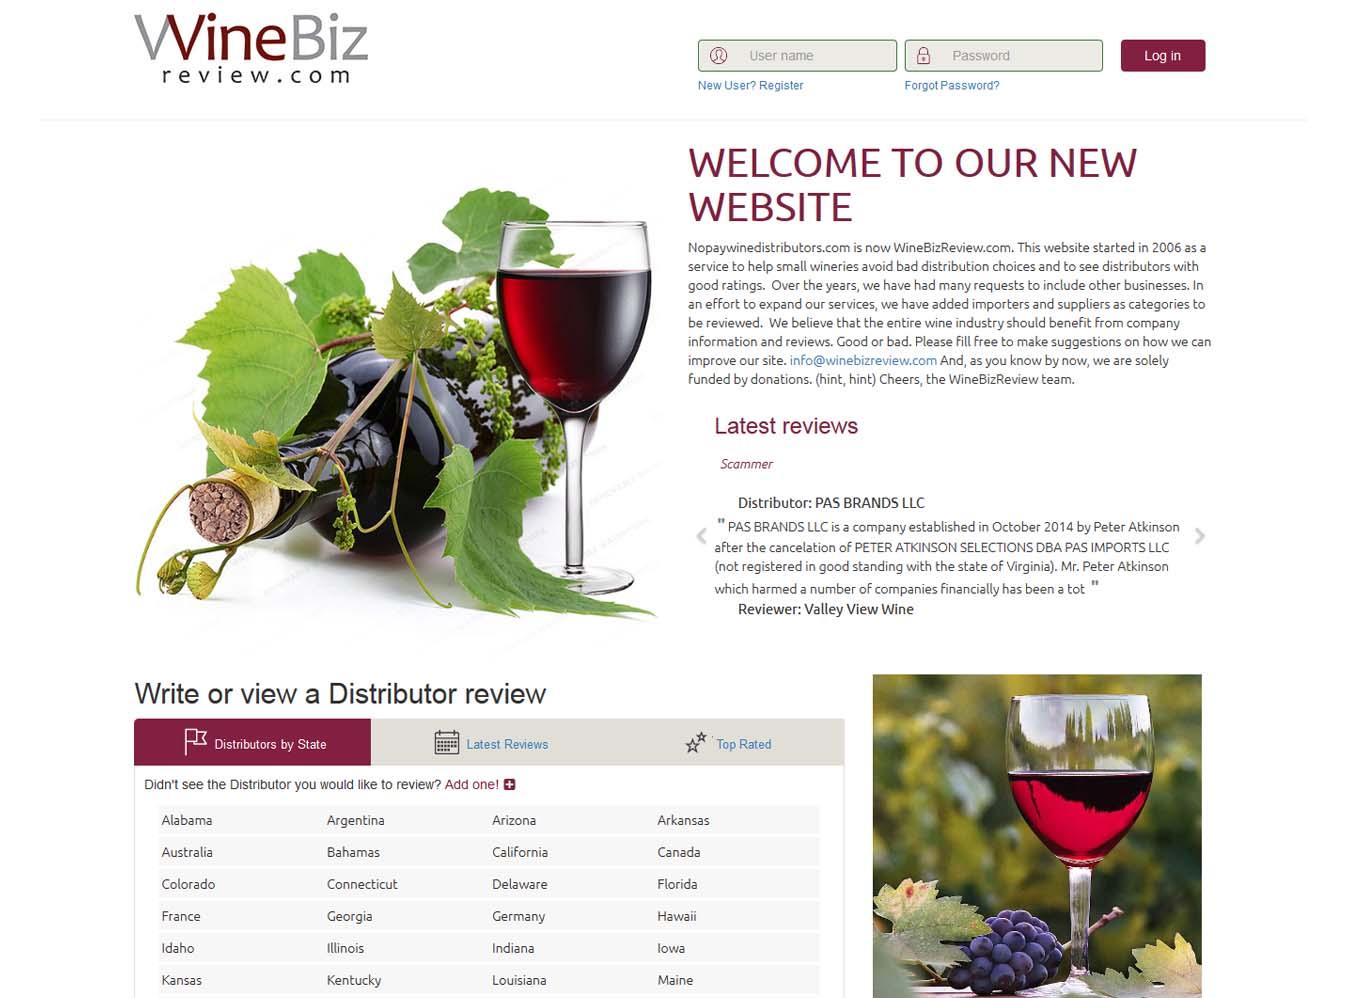 WineBiz